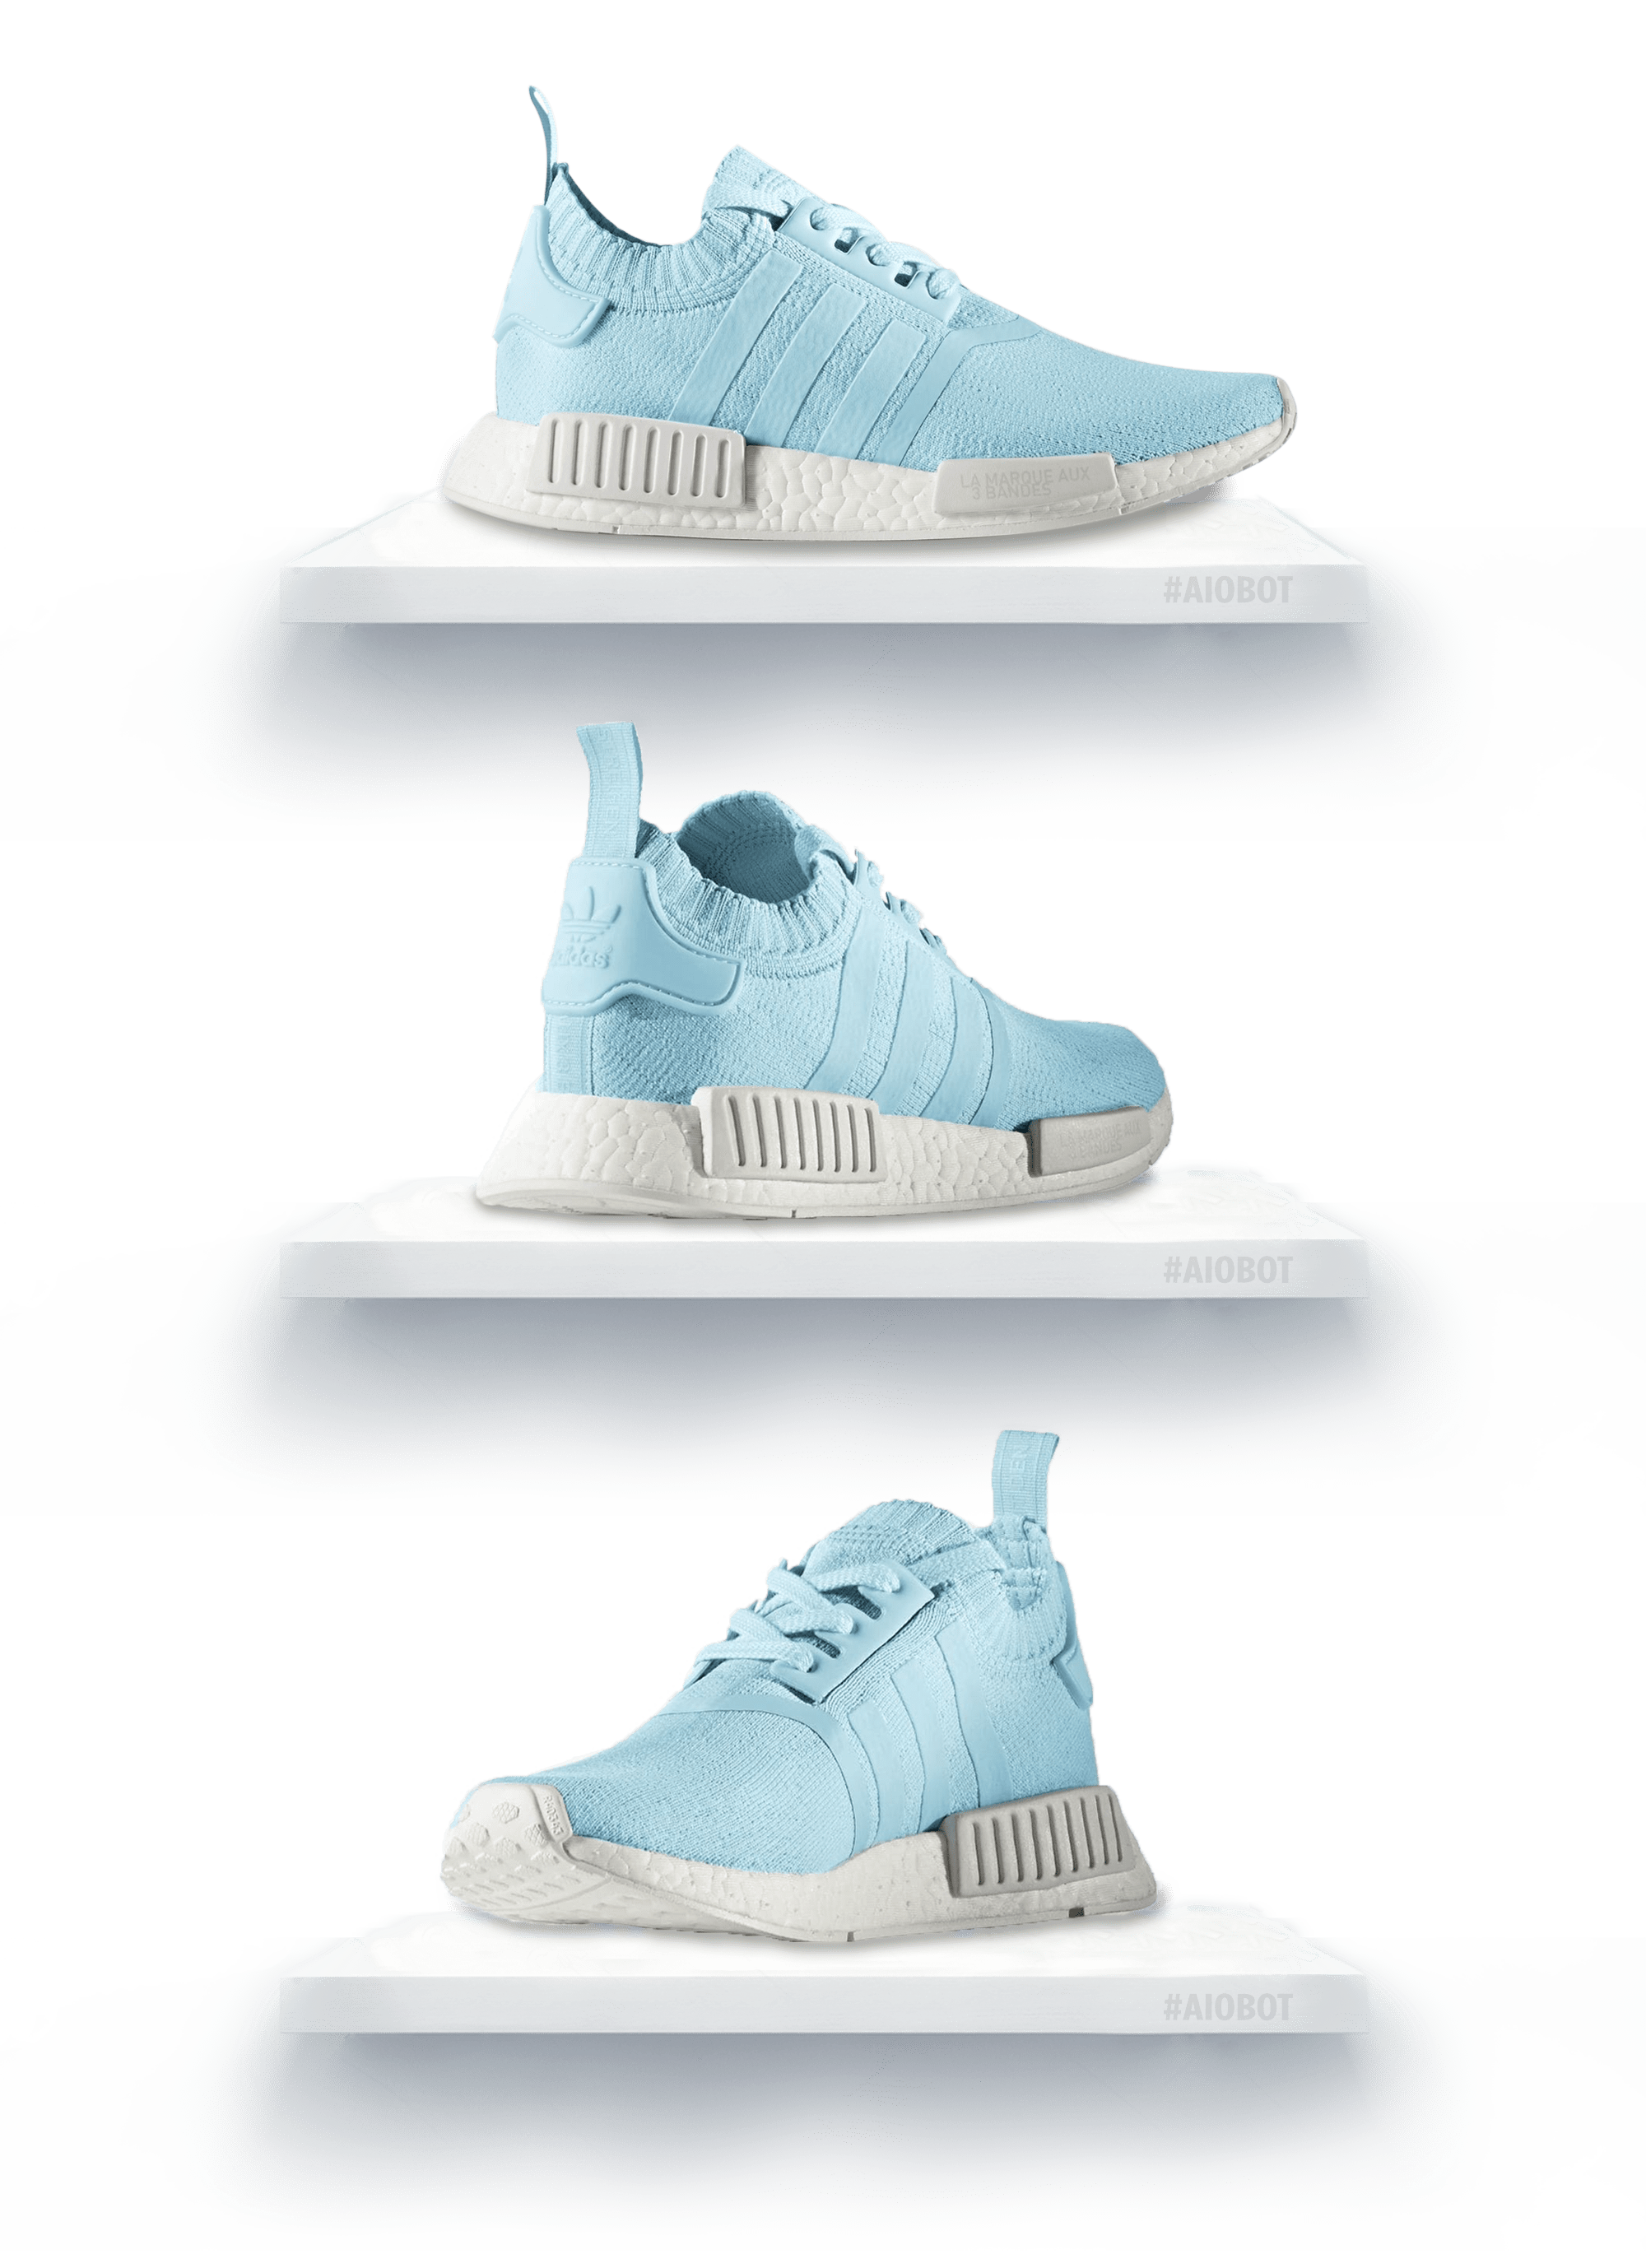 Adidas NMD R1 Ice Blue